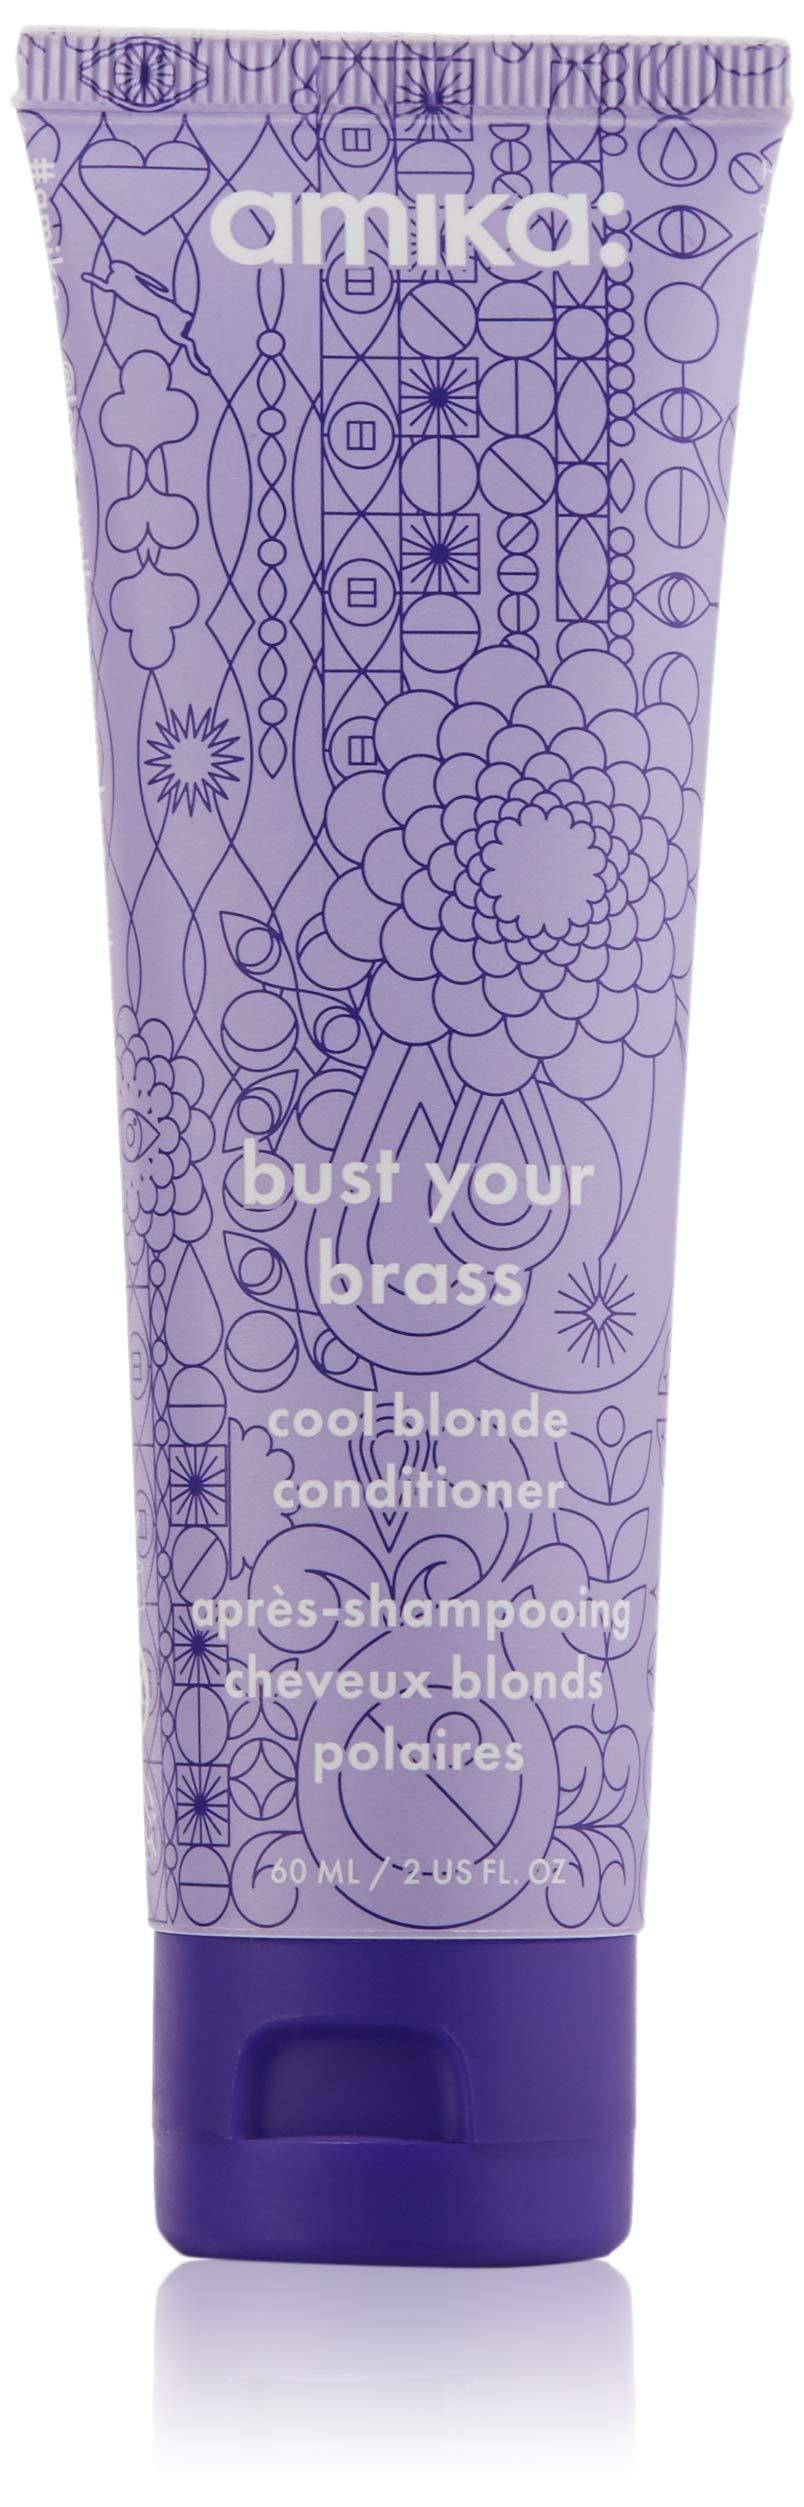 Amazon.com: amika Bust Your Brass Cool Blonde Shampoo, 10